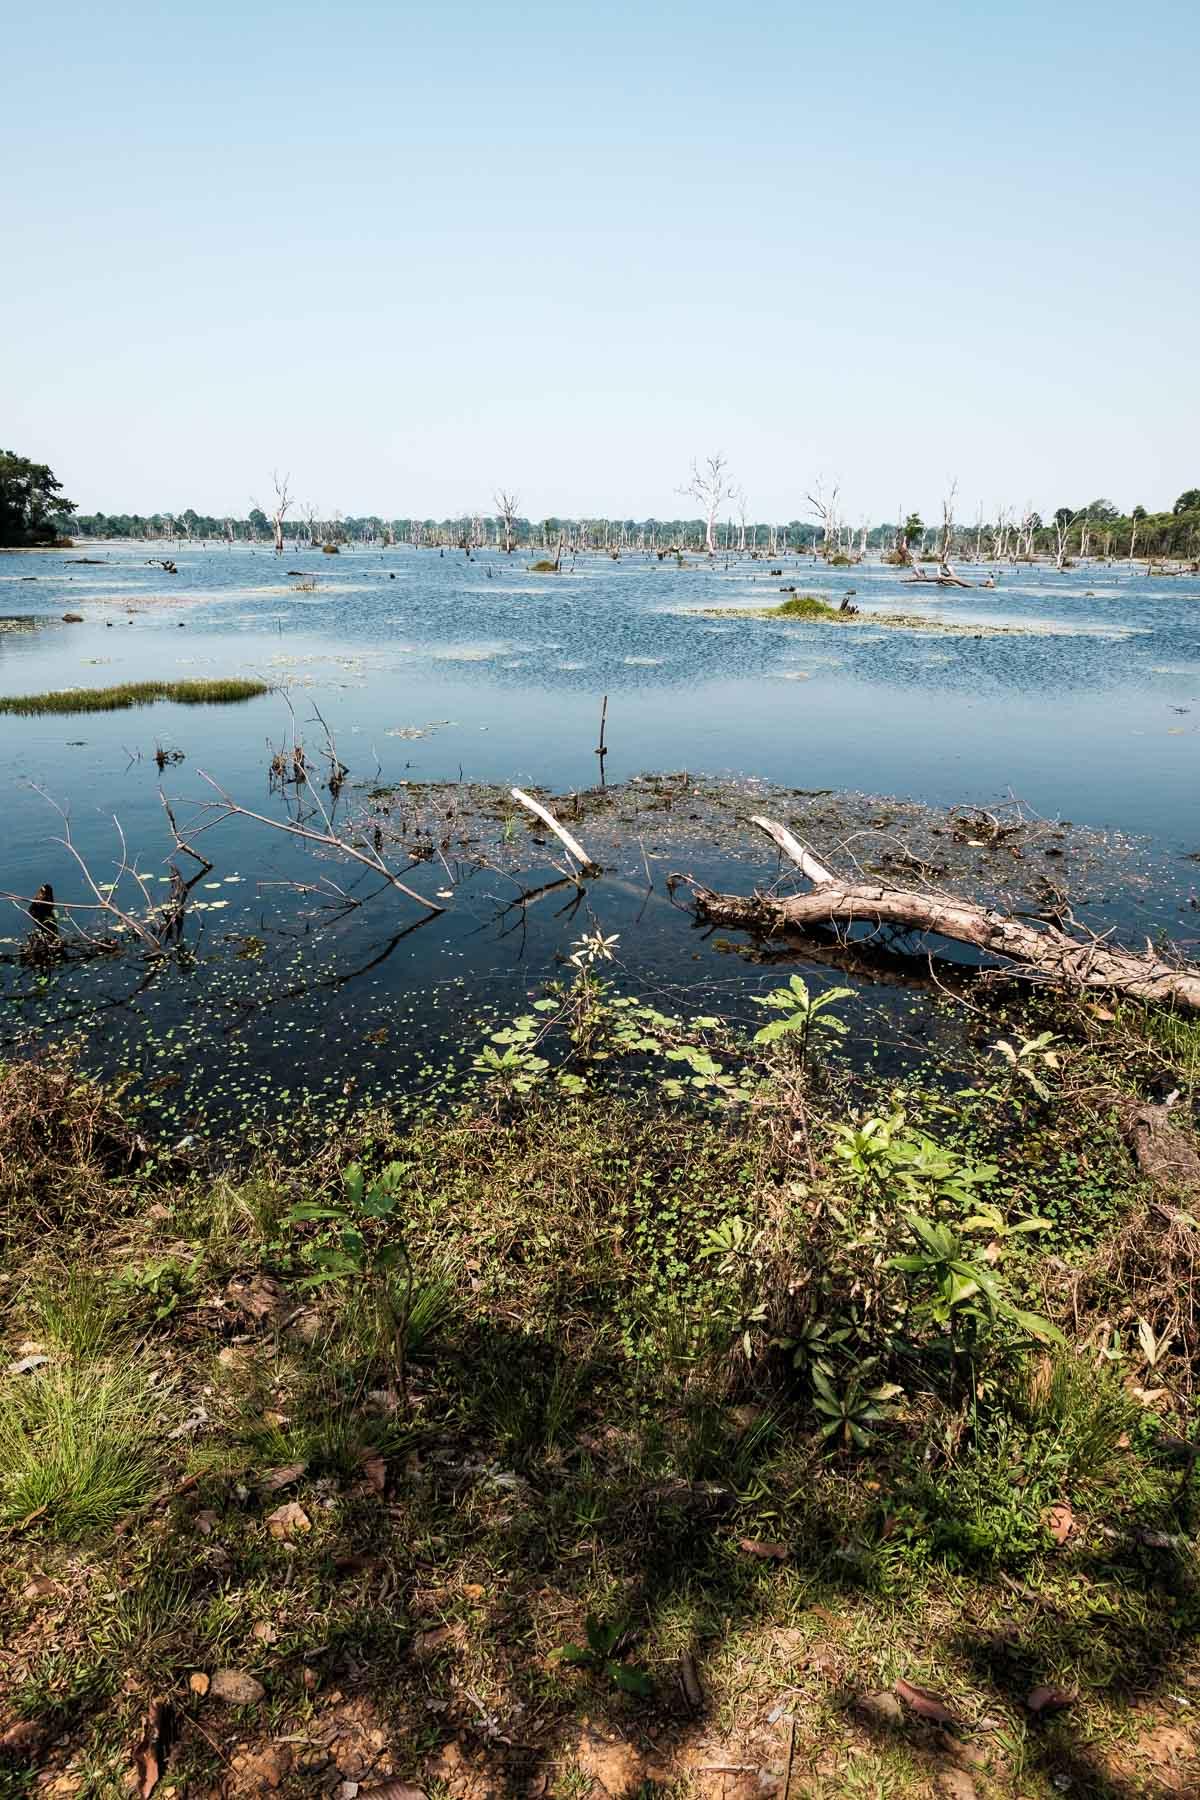 Pond on the way to Neak Pean